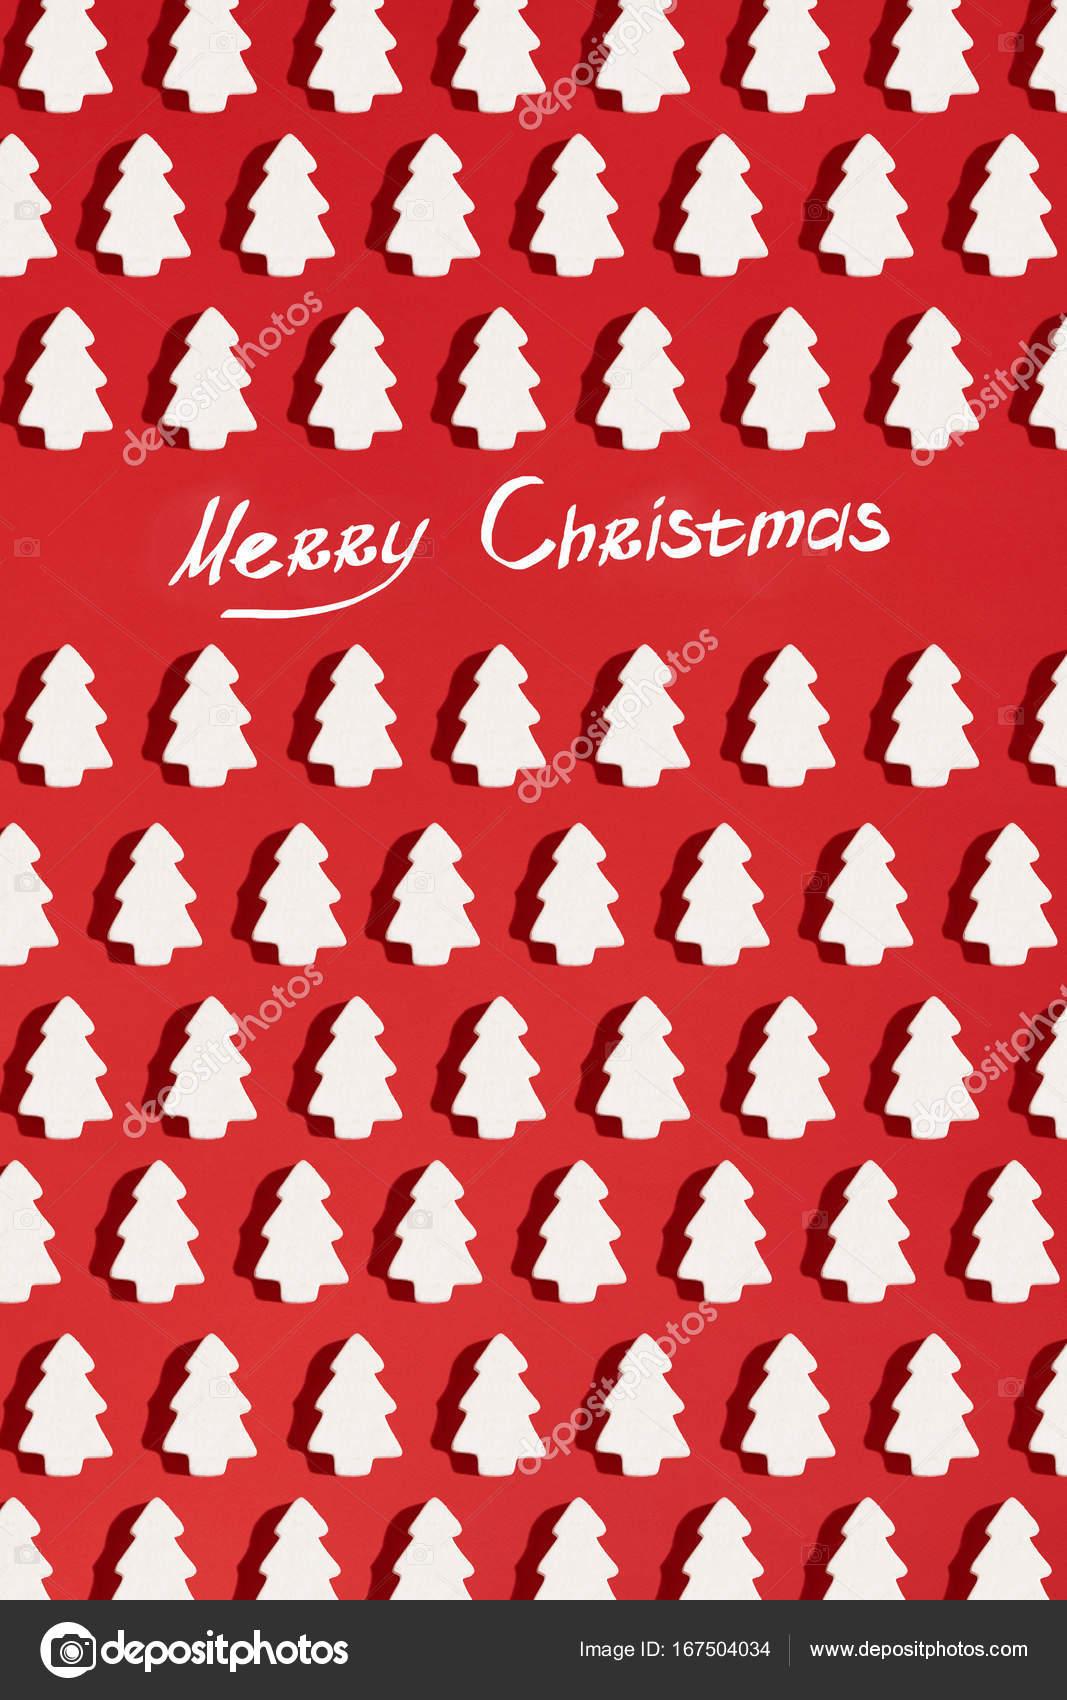 Red And White Christmas Wallpaper : white, christmas, wallpaper, Pattern, White, Christmas, Decoration, Background., Wallpaper., Stock, Photo,, Image, Nazarov.dnepr@gmail.com, #167504034